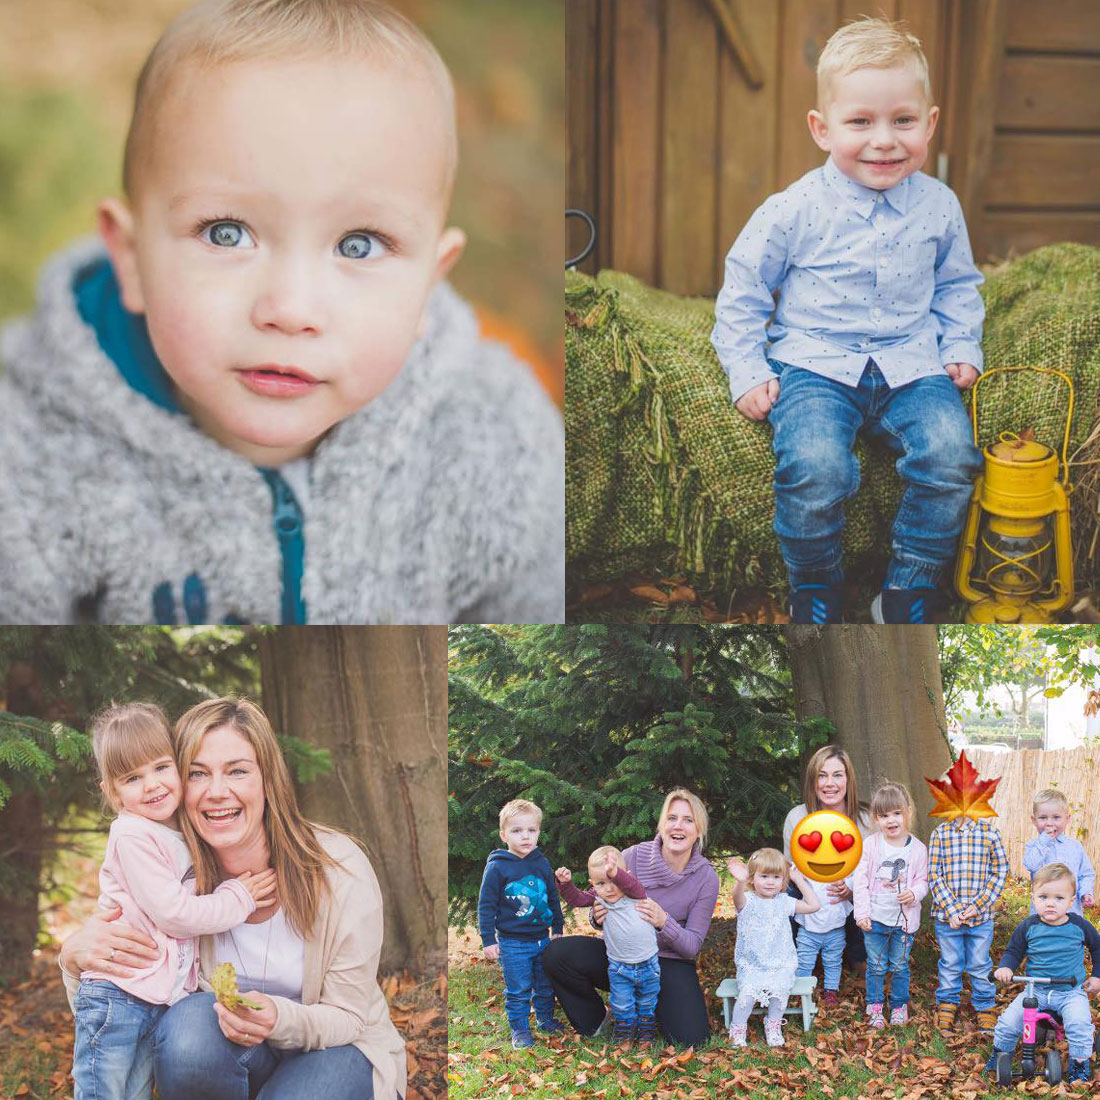 5Stars Kindertagespflege Tagesmutter Lübeck Herbst Fotoshooting 2018